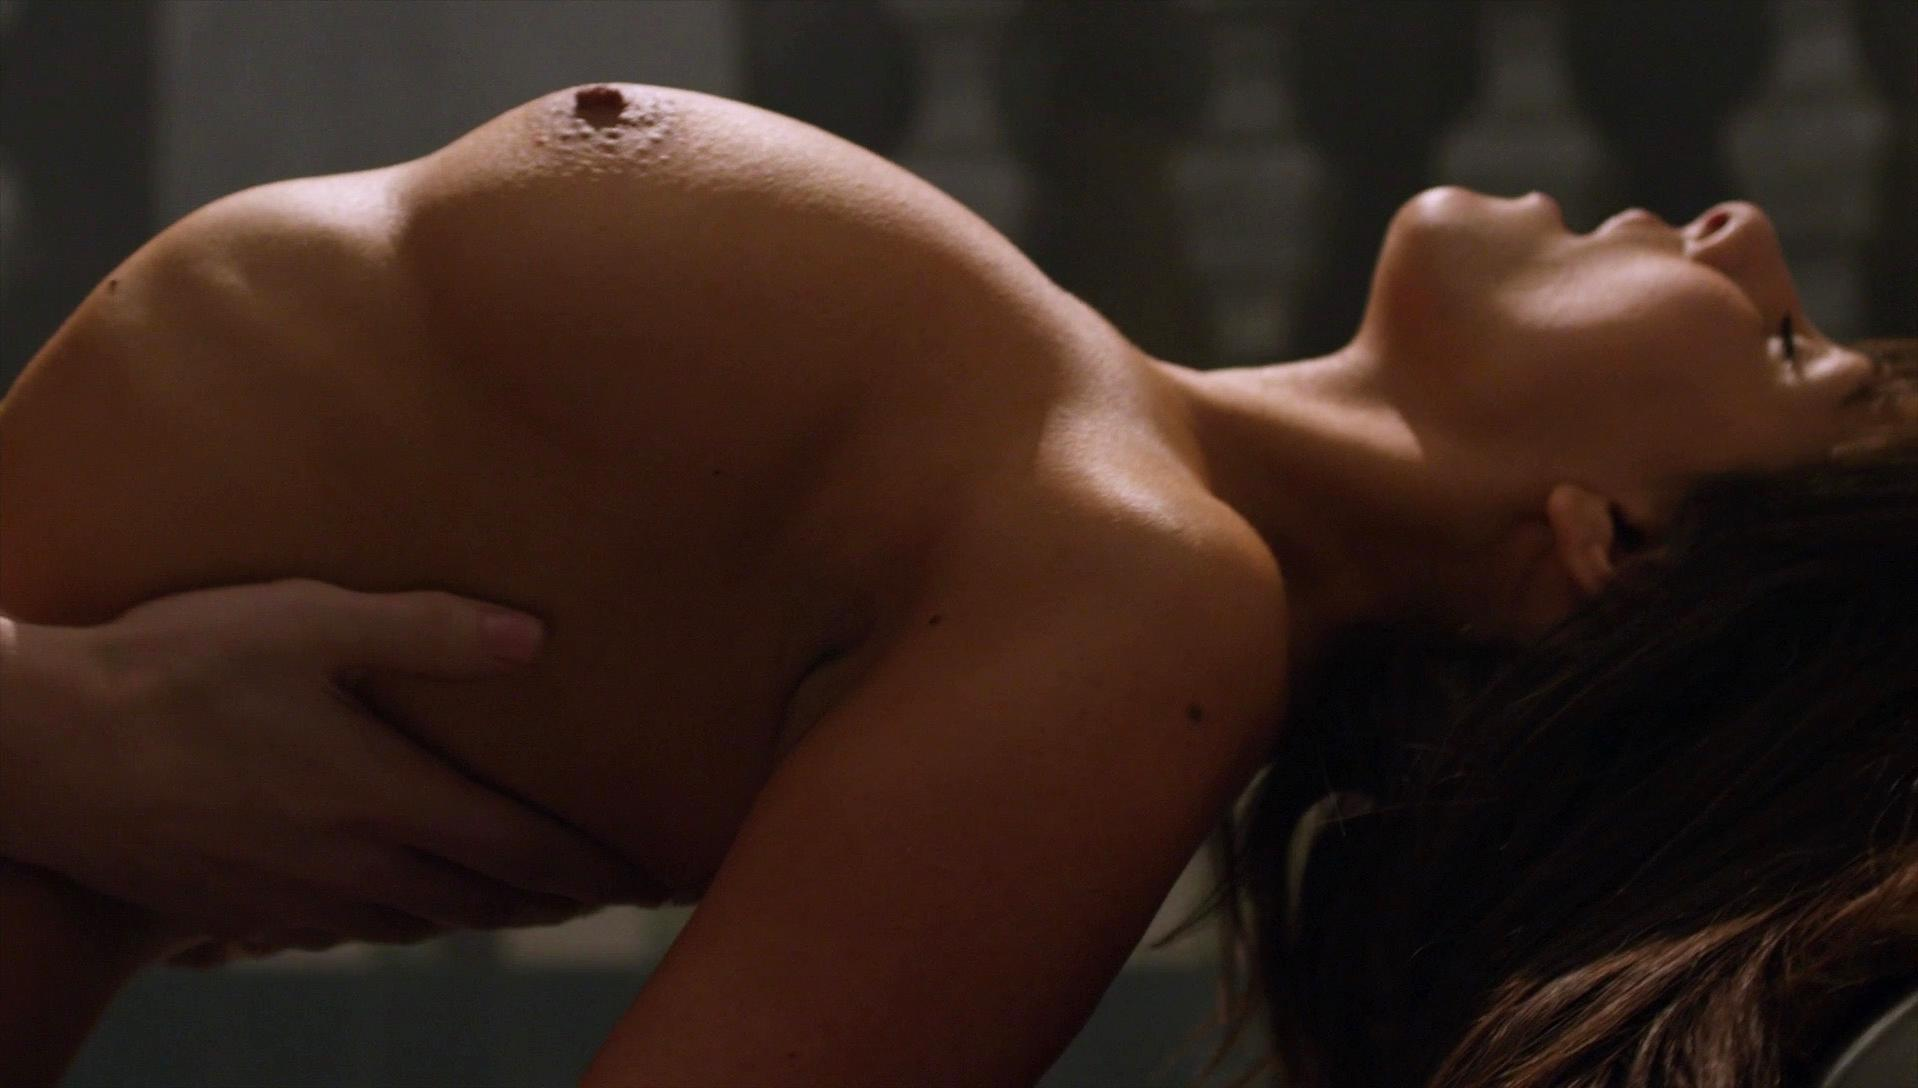 Women naked tan line